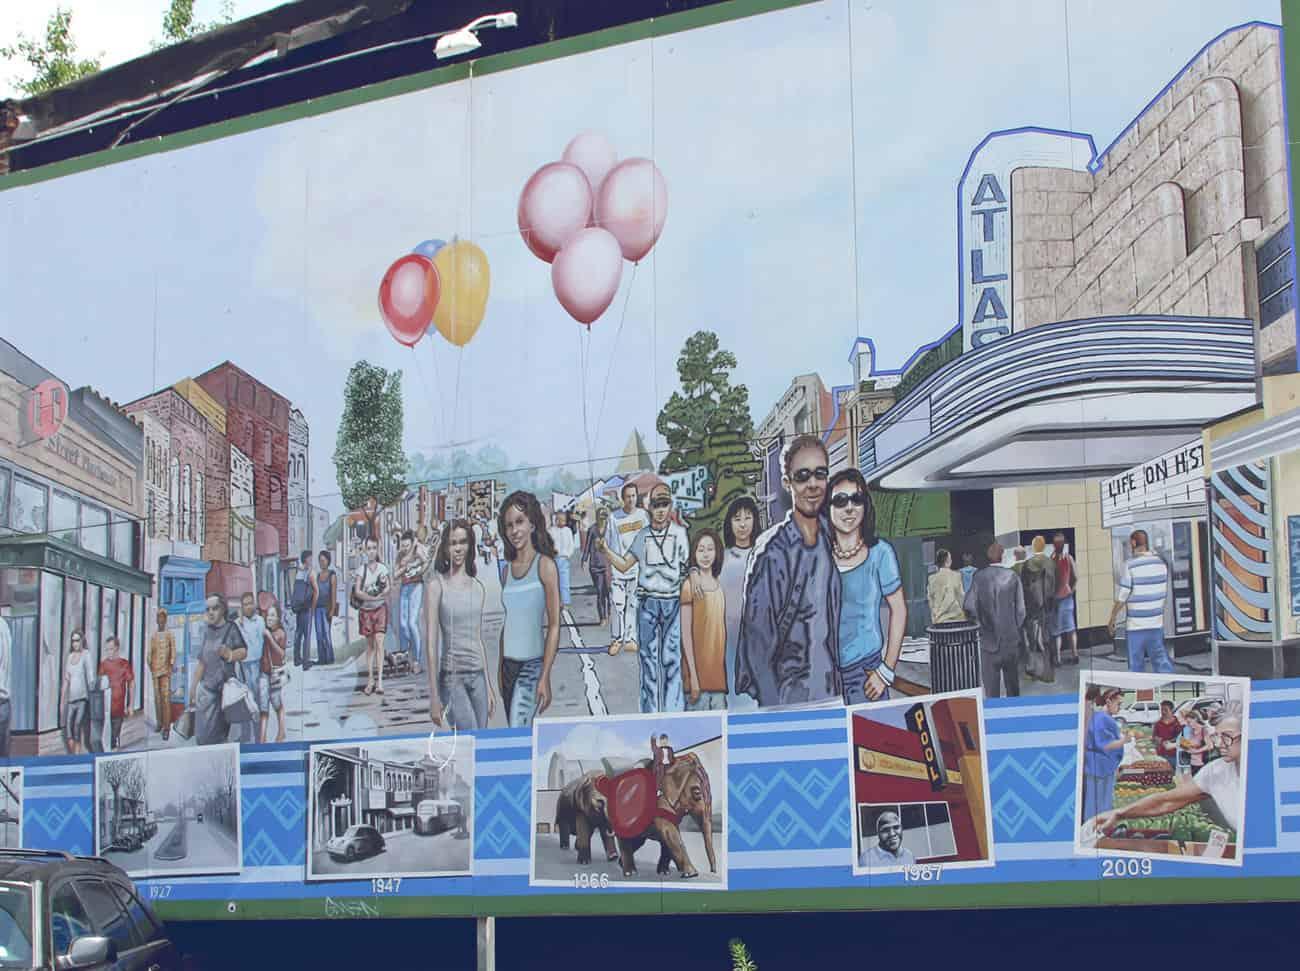 H Street mural